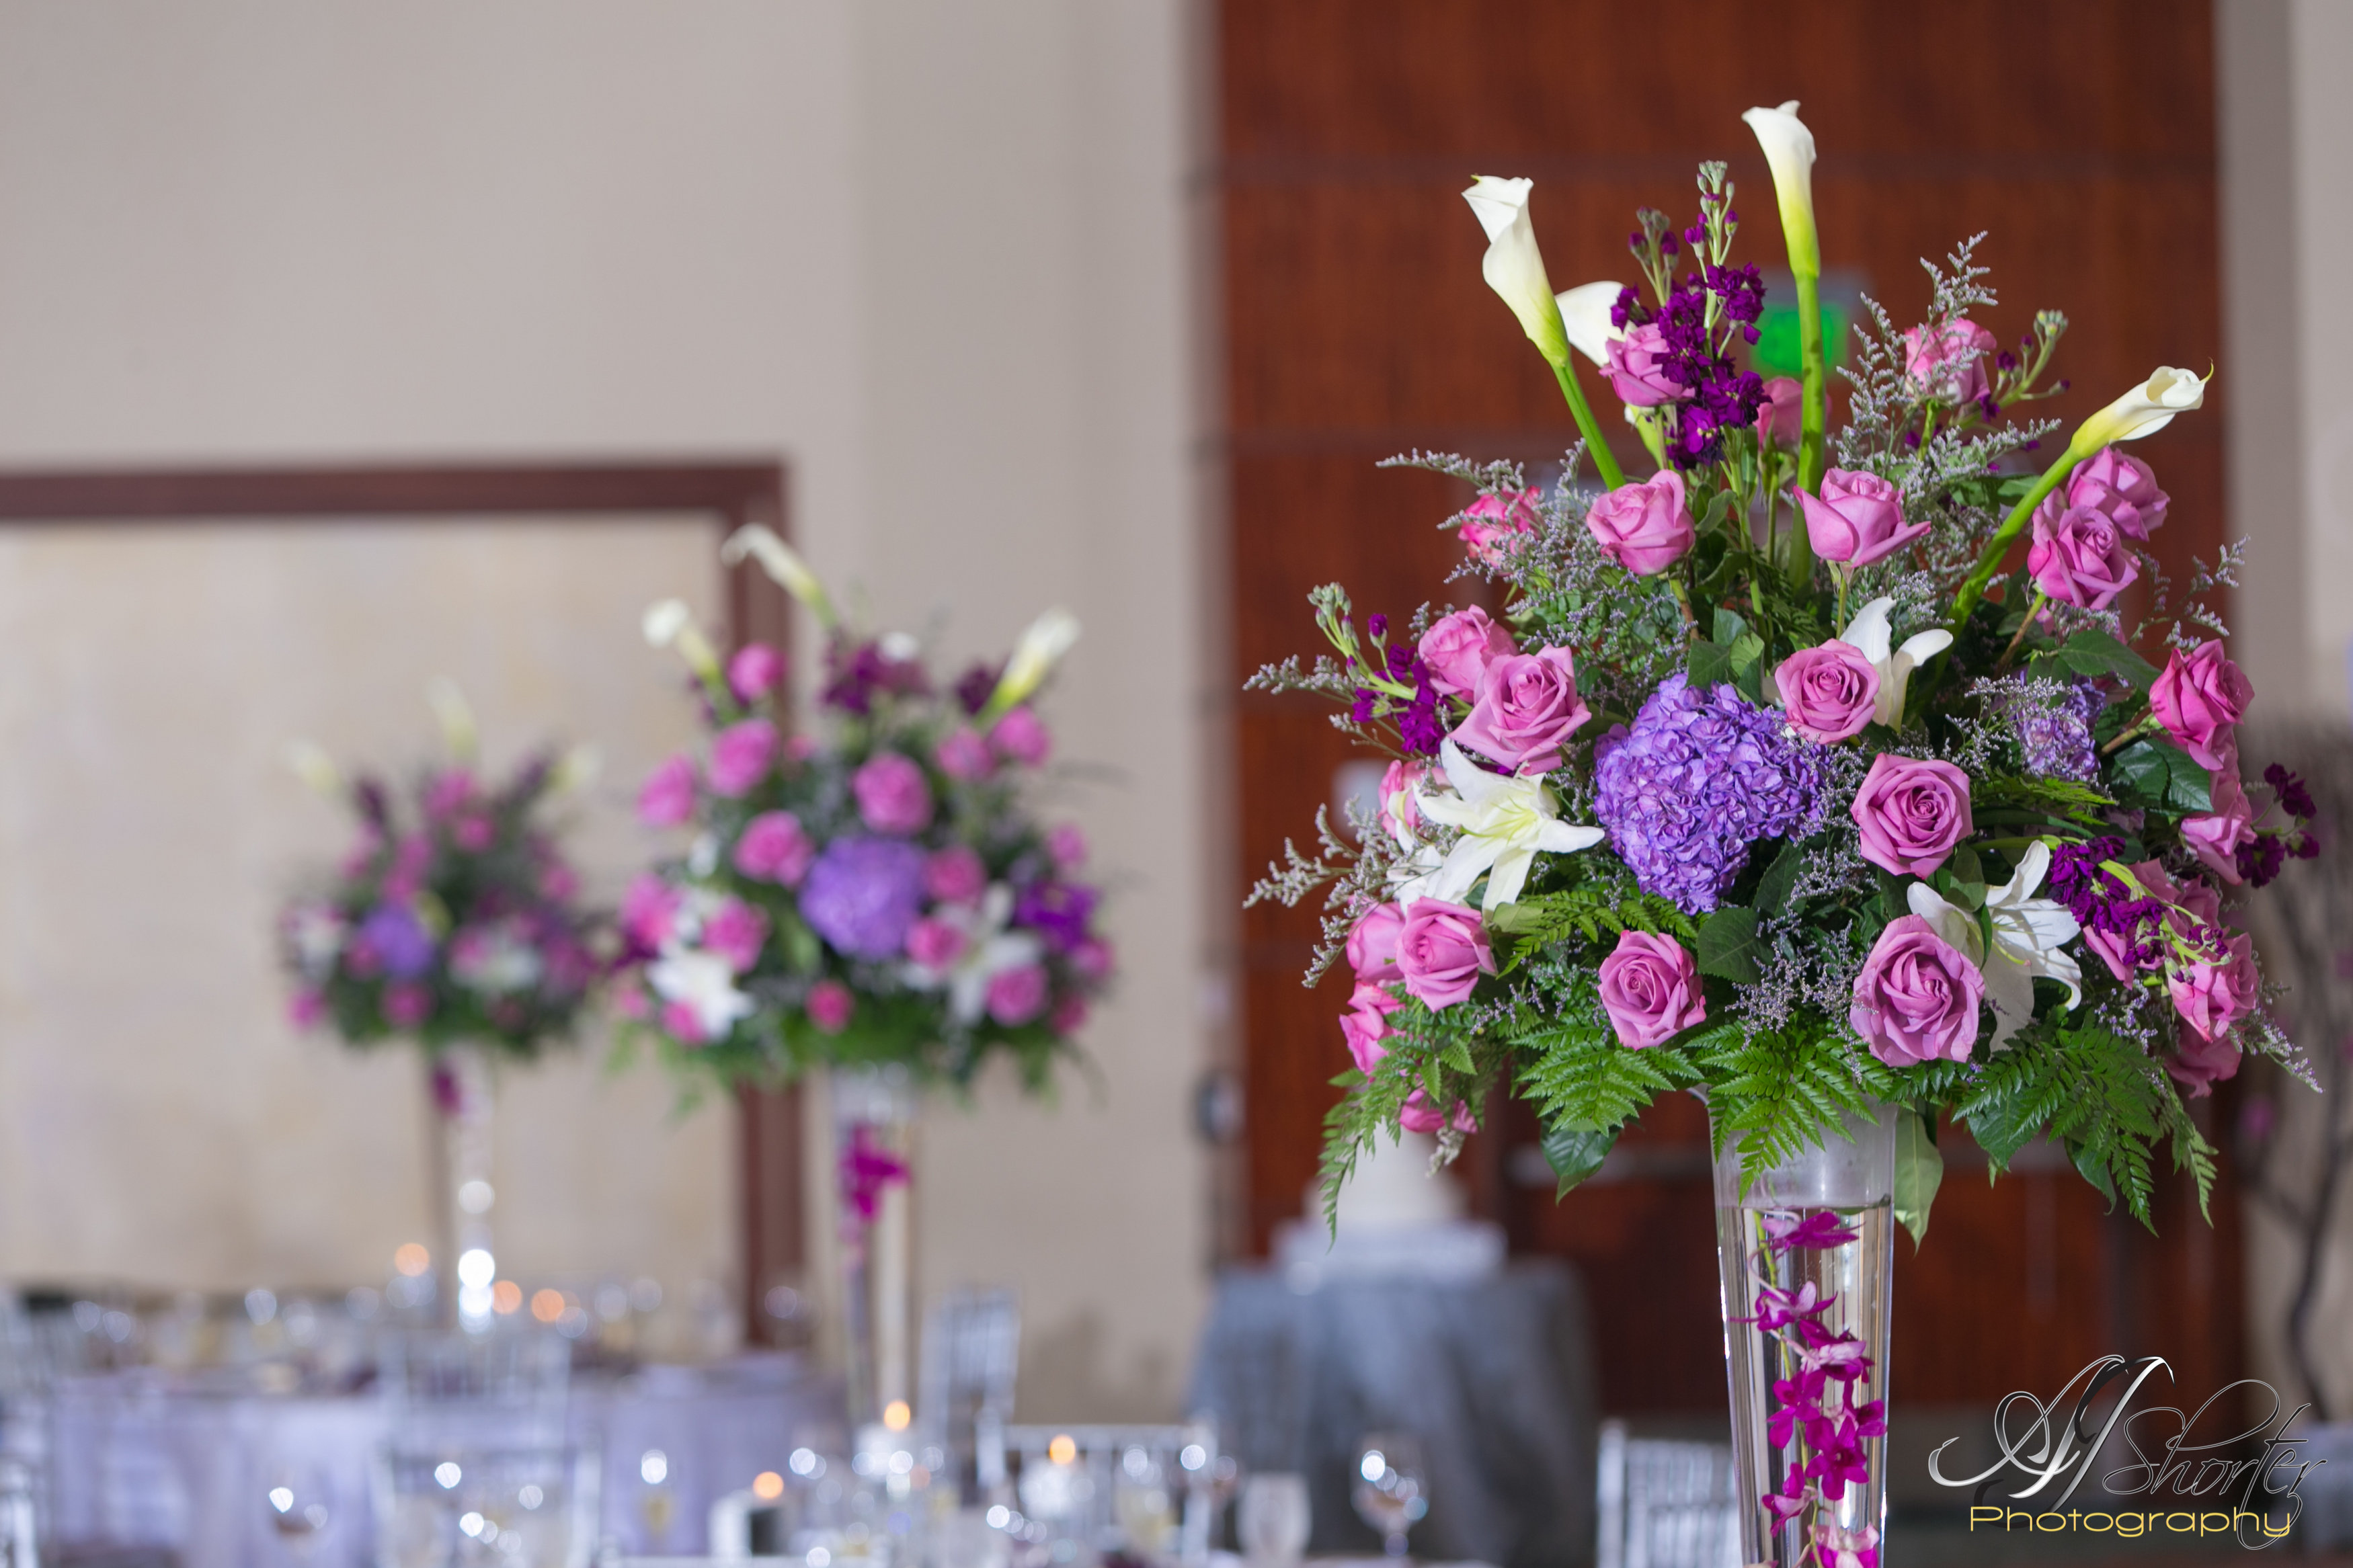 Wedding reception- tall centerpieces